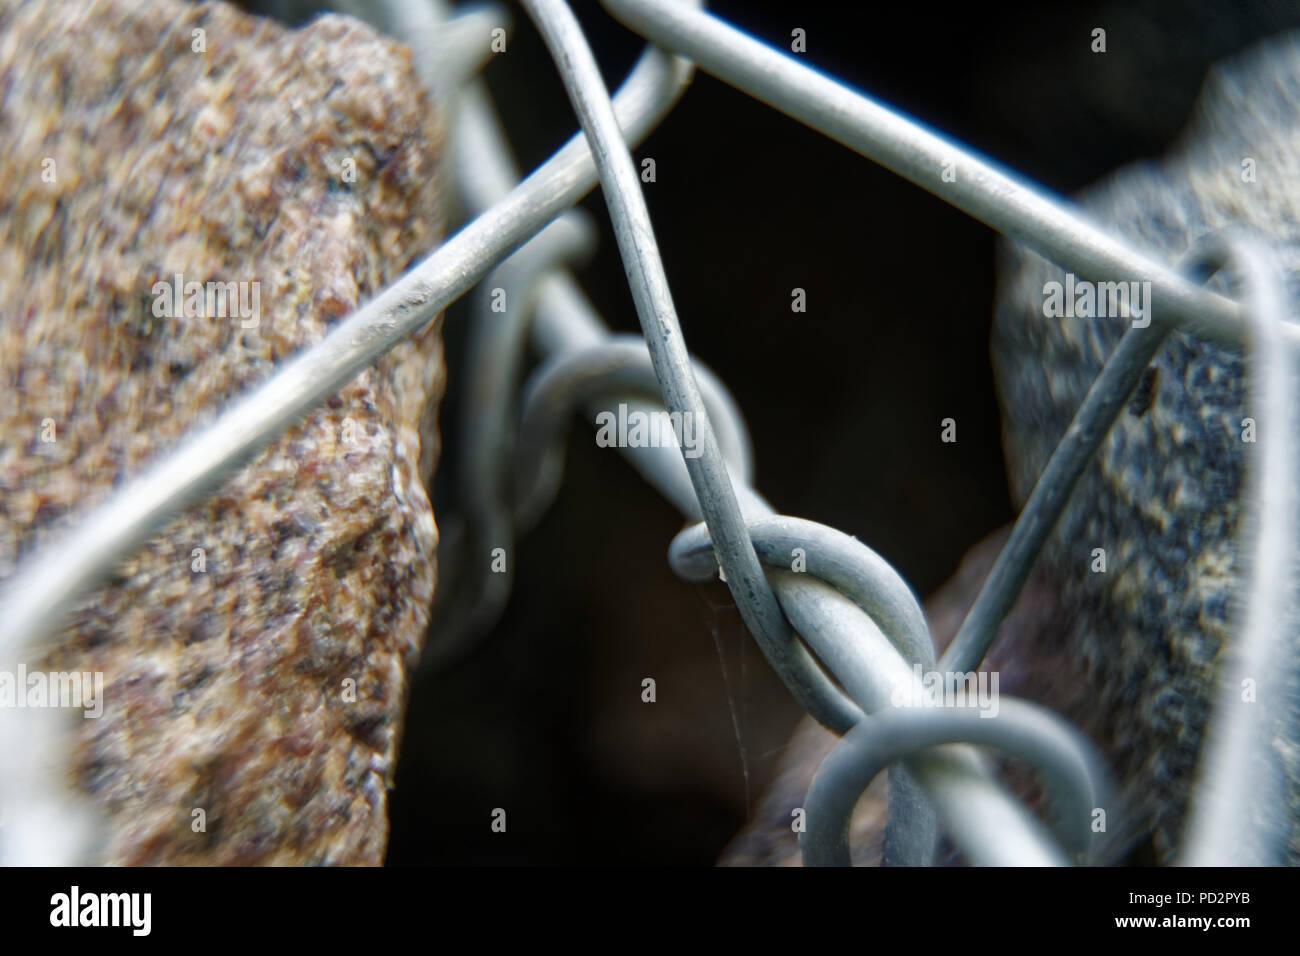 Aluminum wire twisted on stone object, macro background. - Stock Image